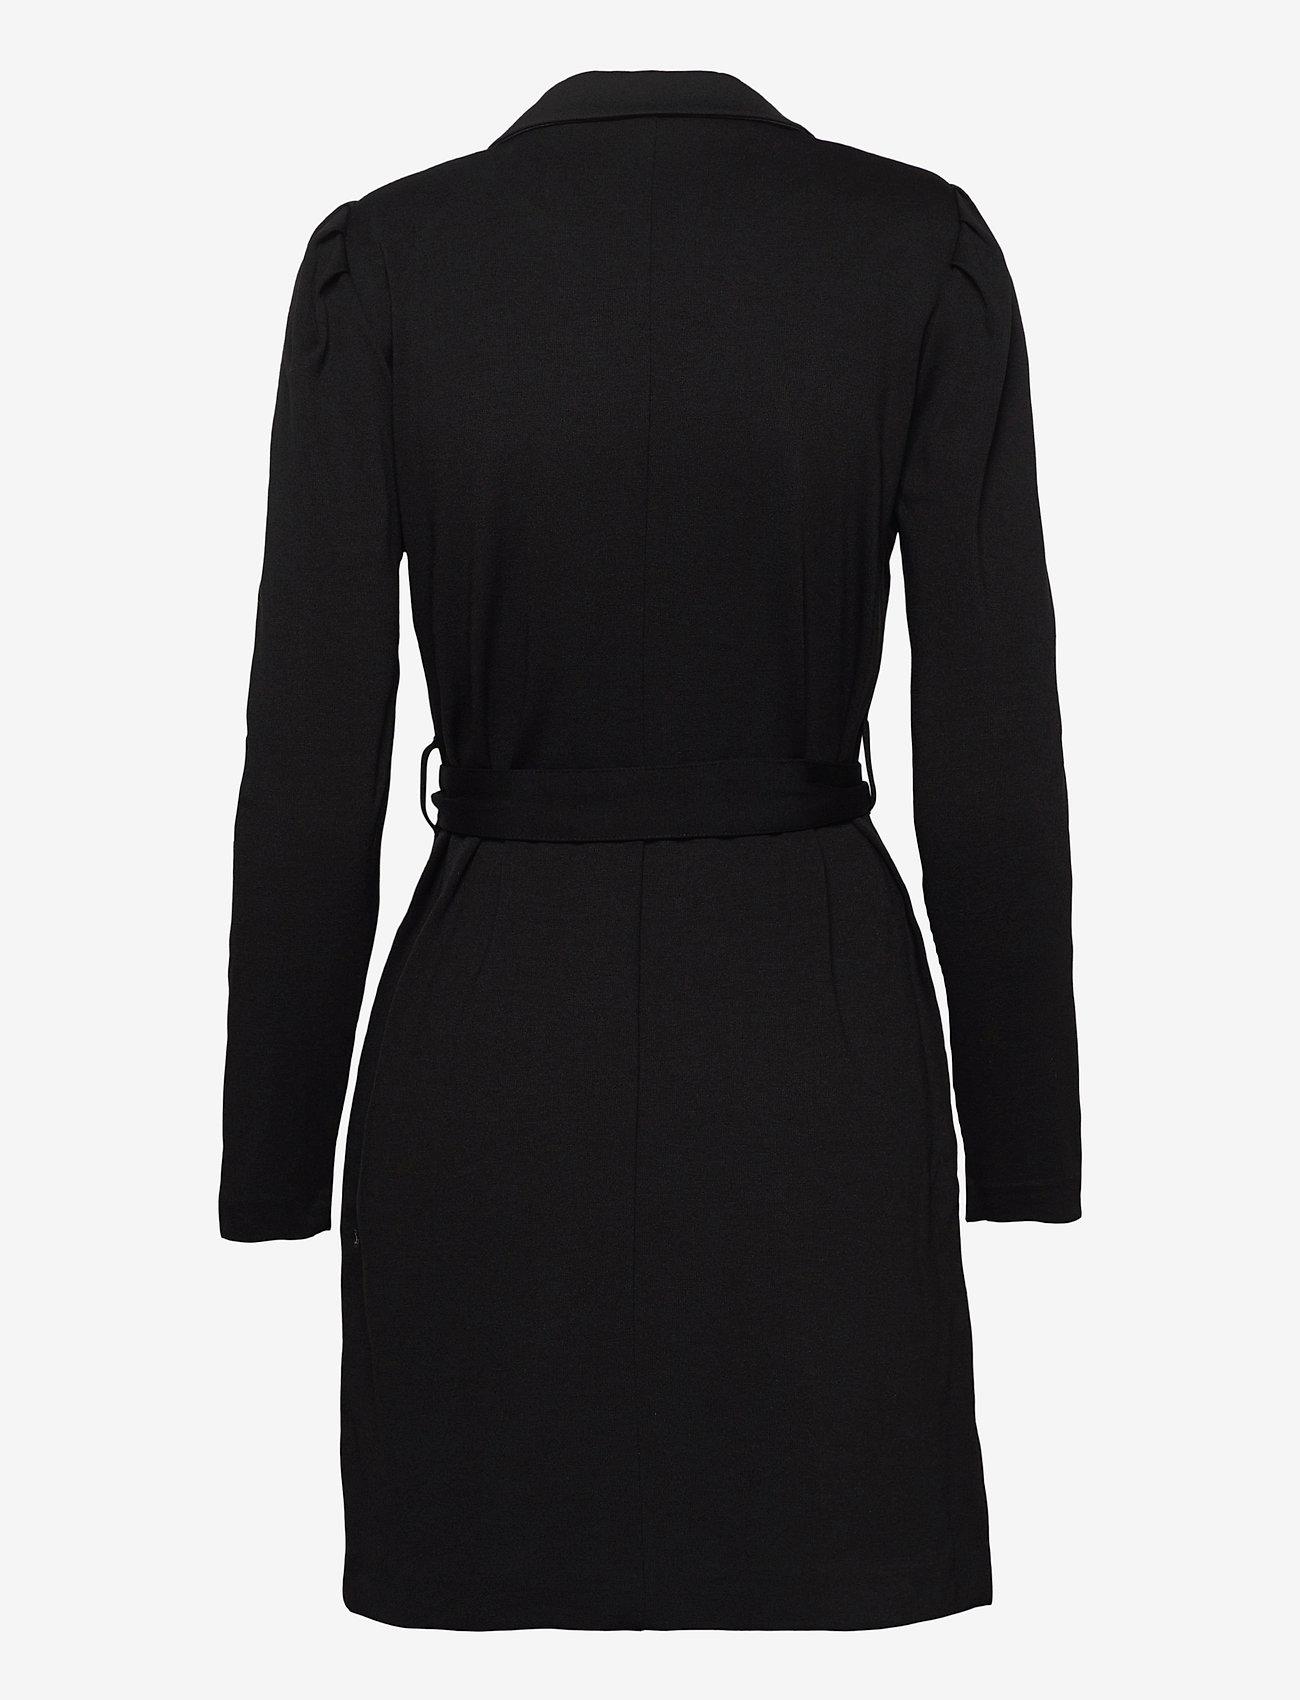 ICHI - IHKATE TREND DR7 - short dresses - black - 1